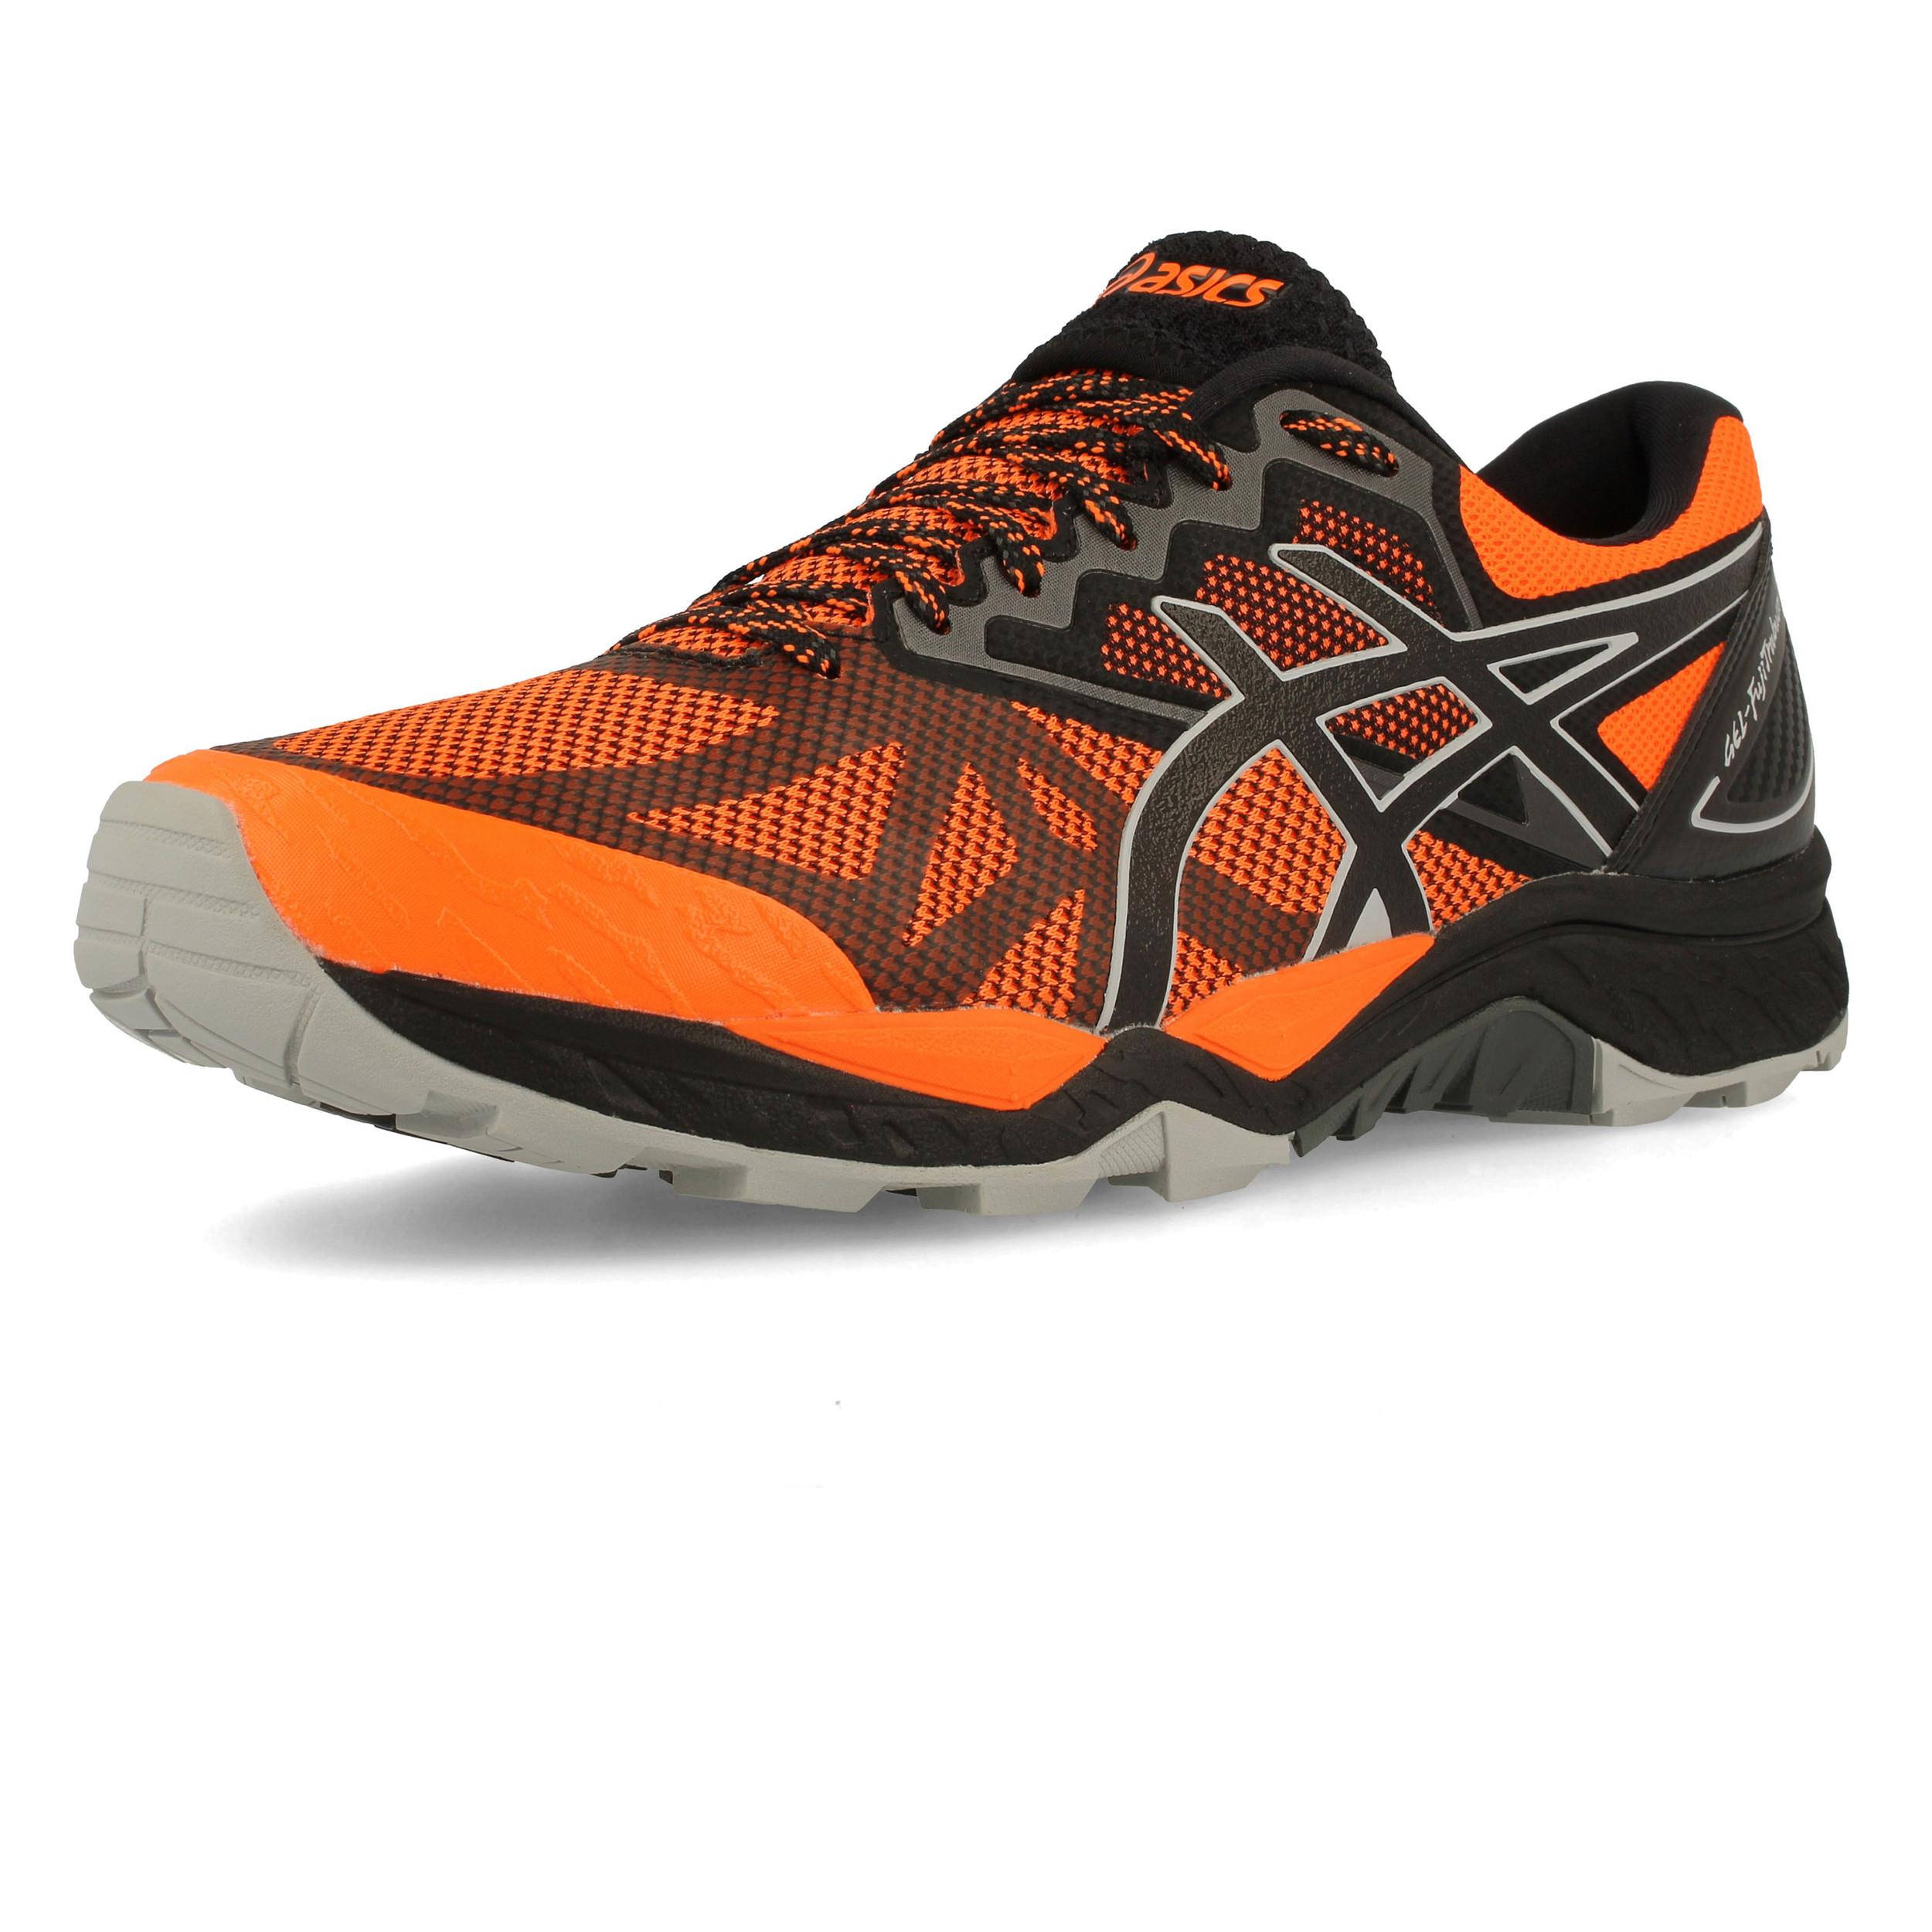 À Pied Asics Trail Trabuco Course Chaussures Gel Fuji 6 De Hommes wqgOz